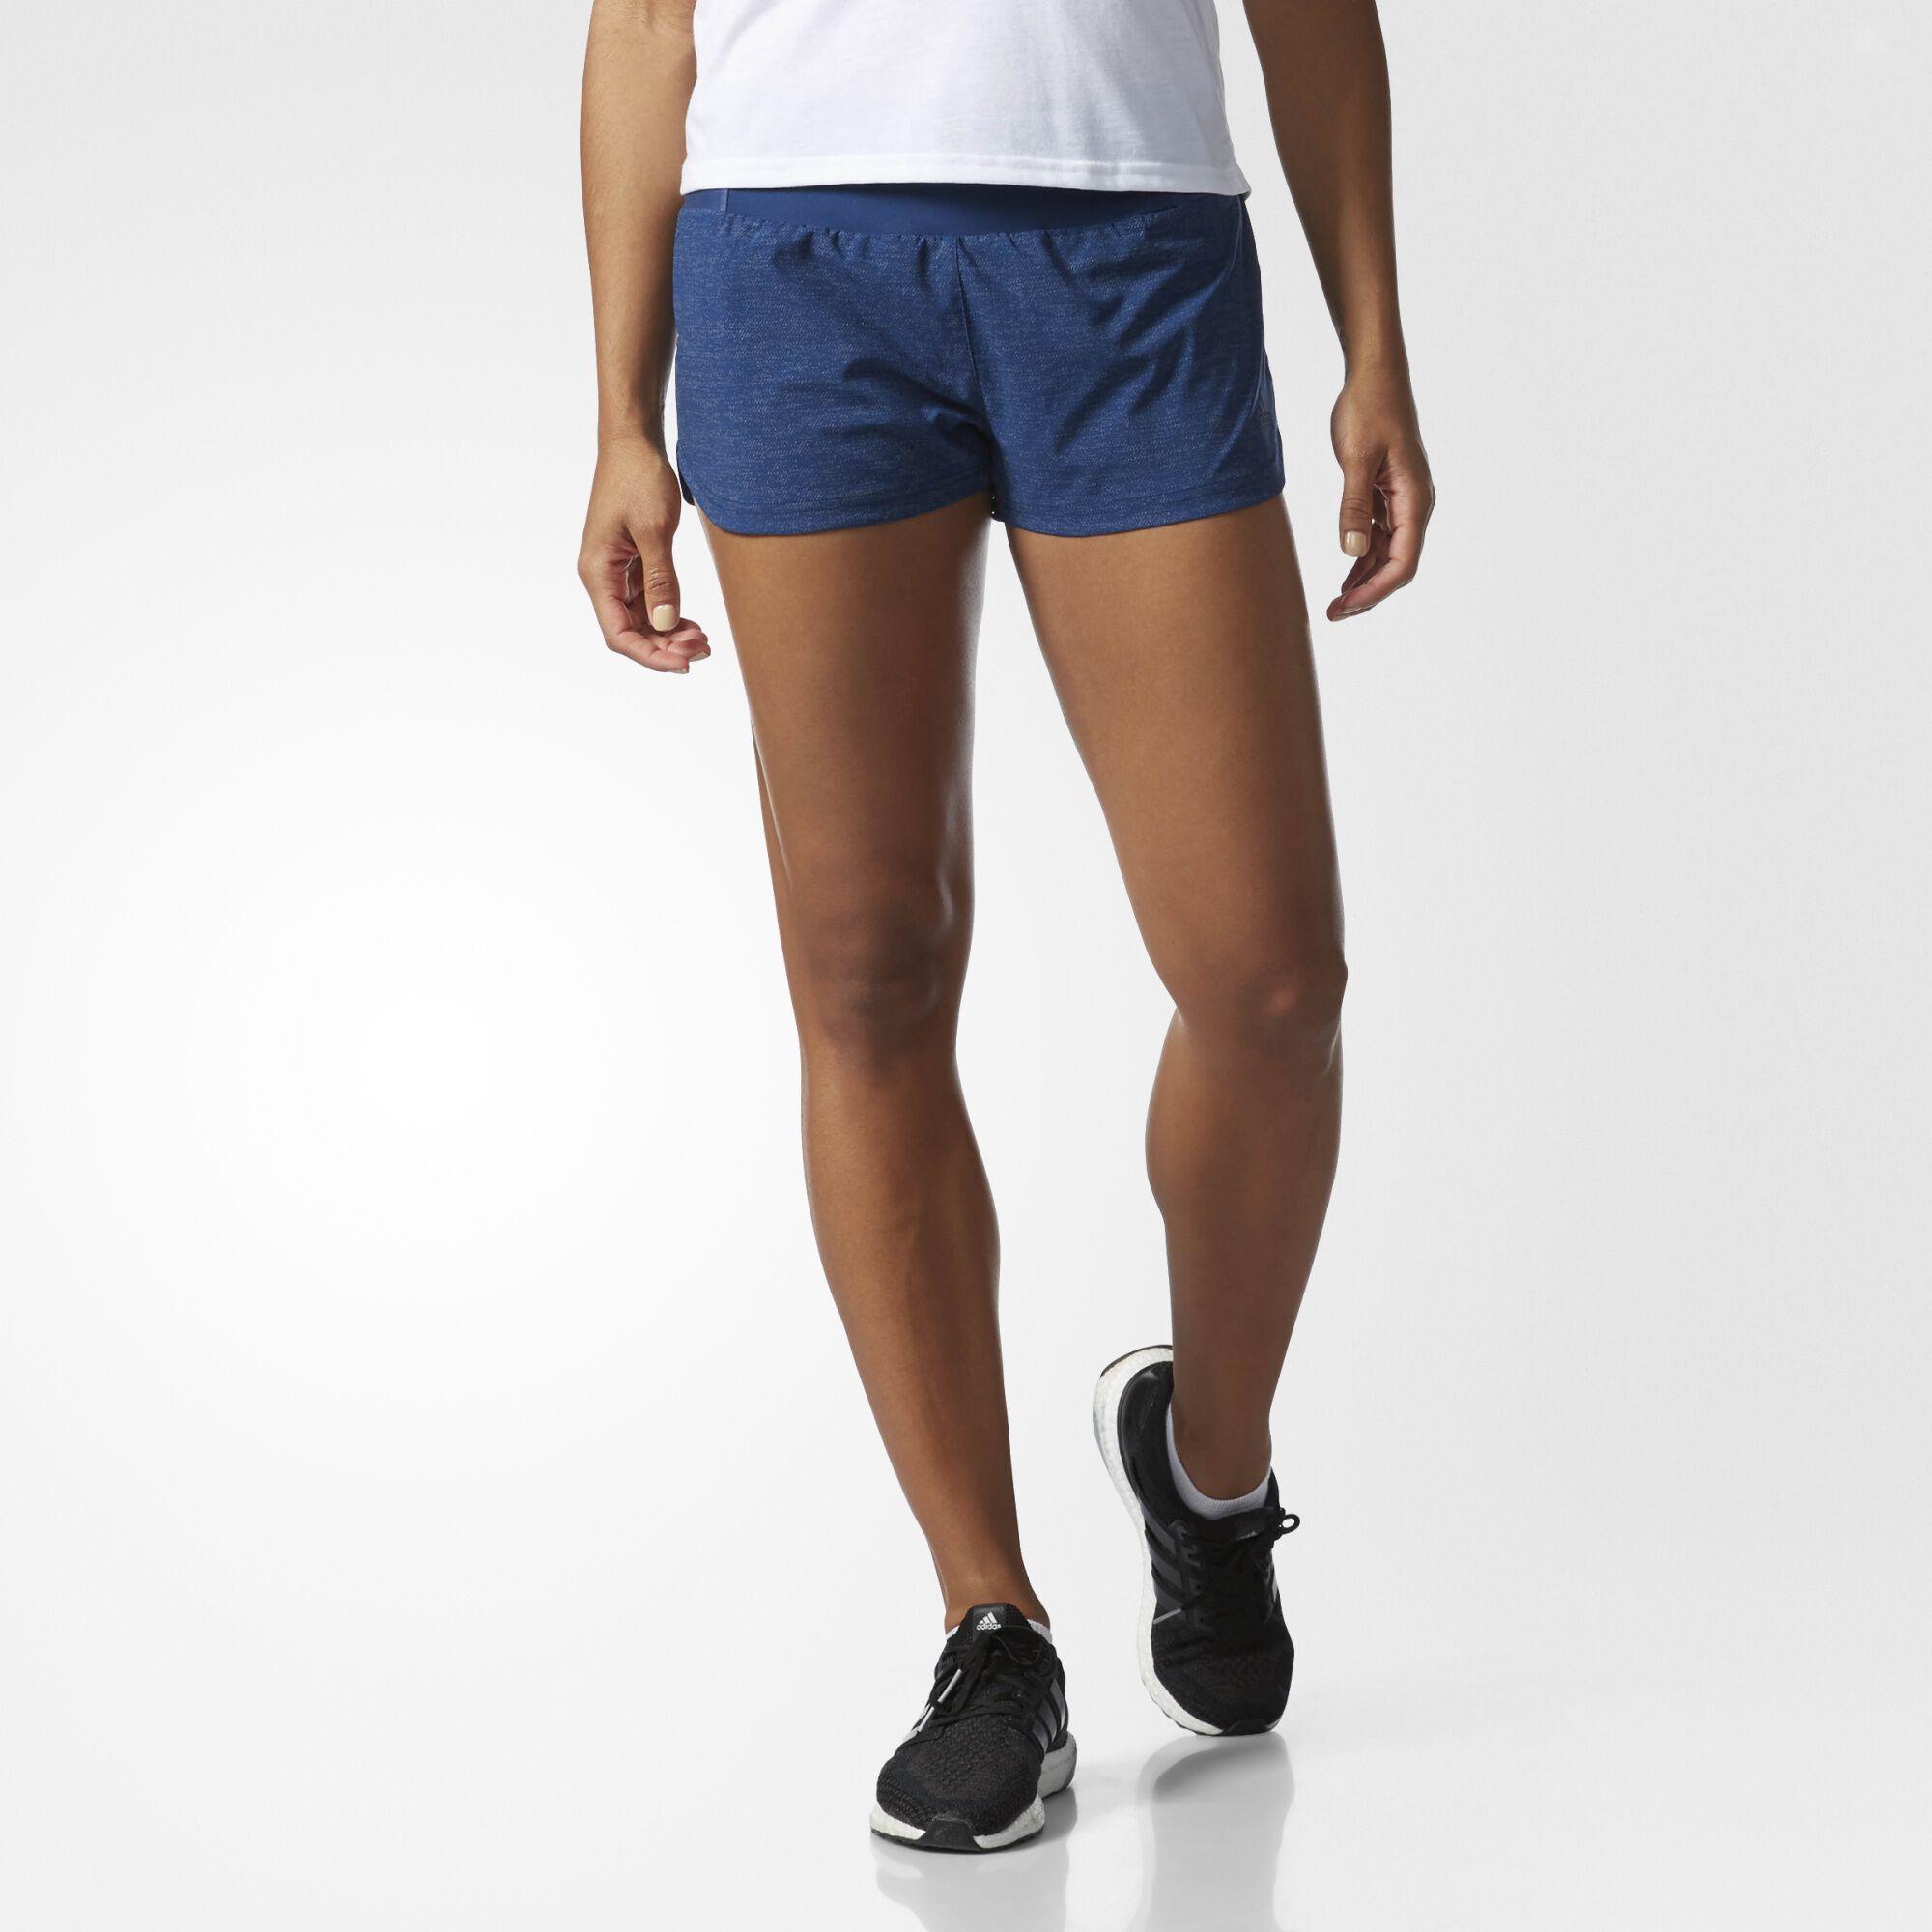 adidas pants women soccer American Football Shoes